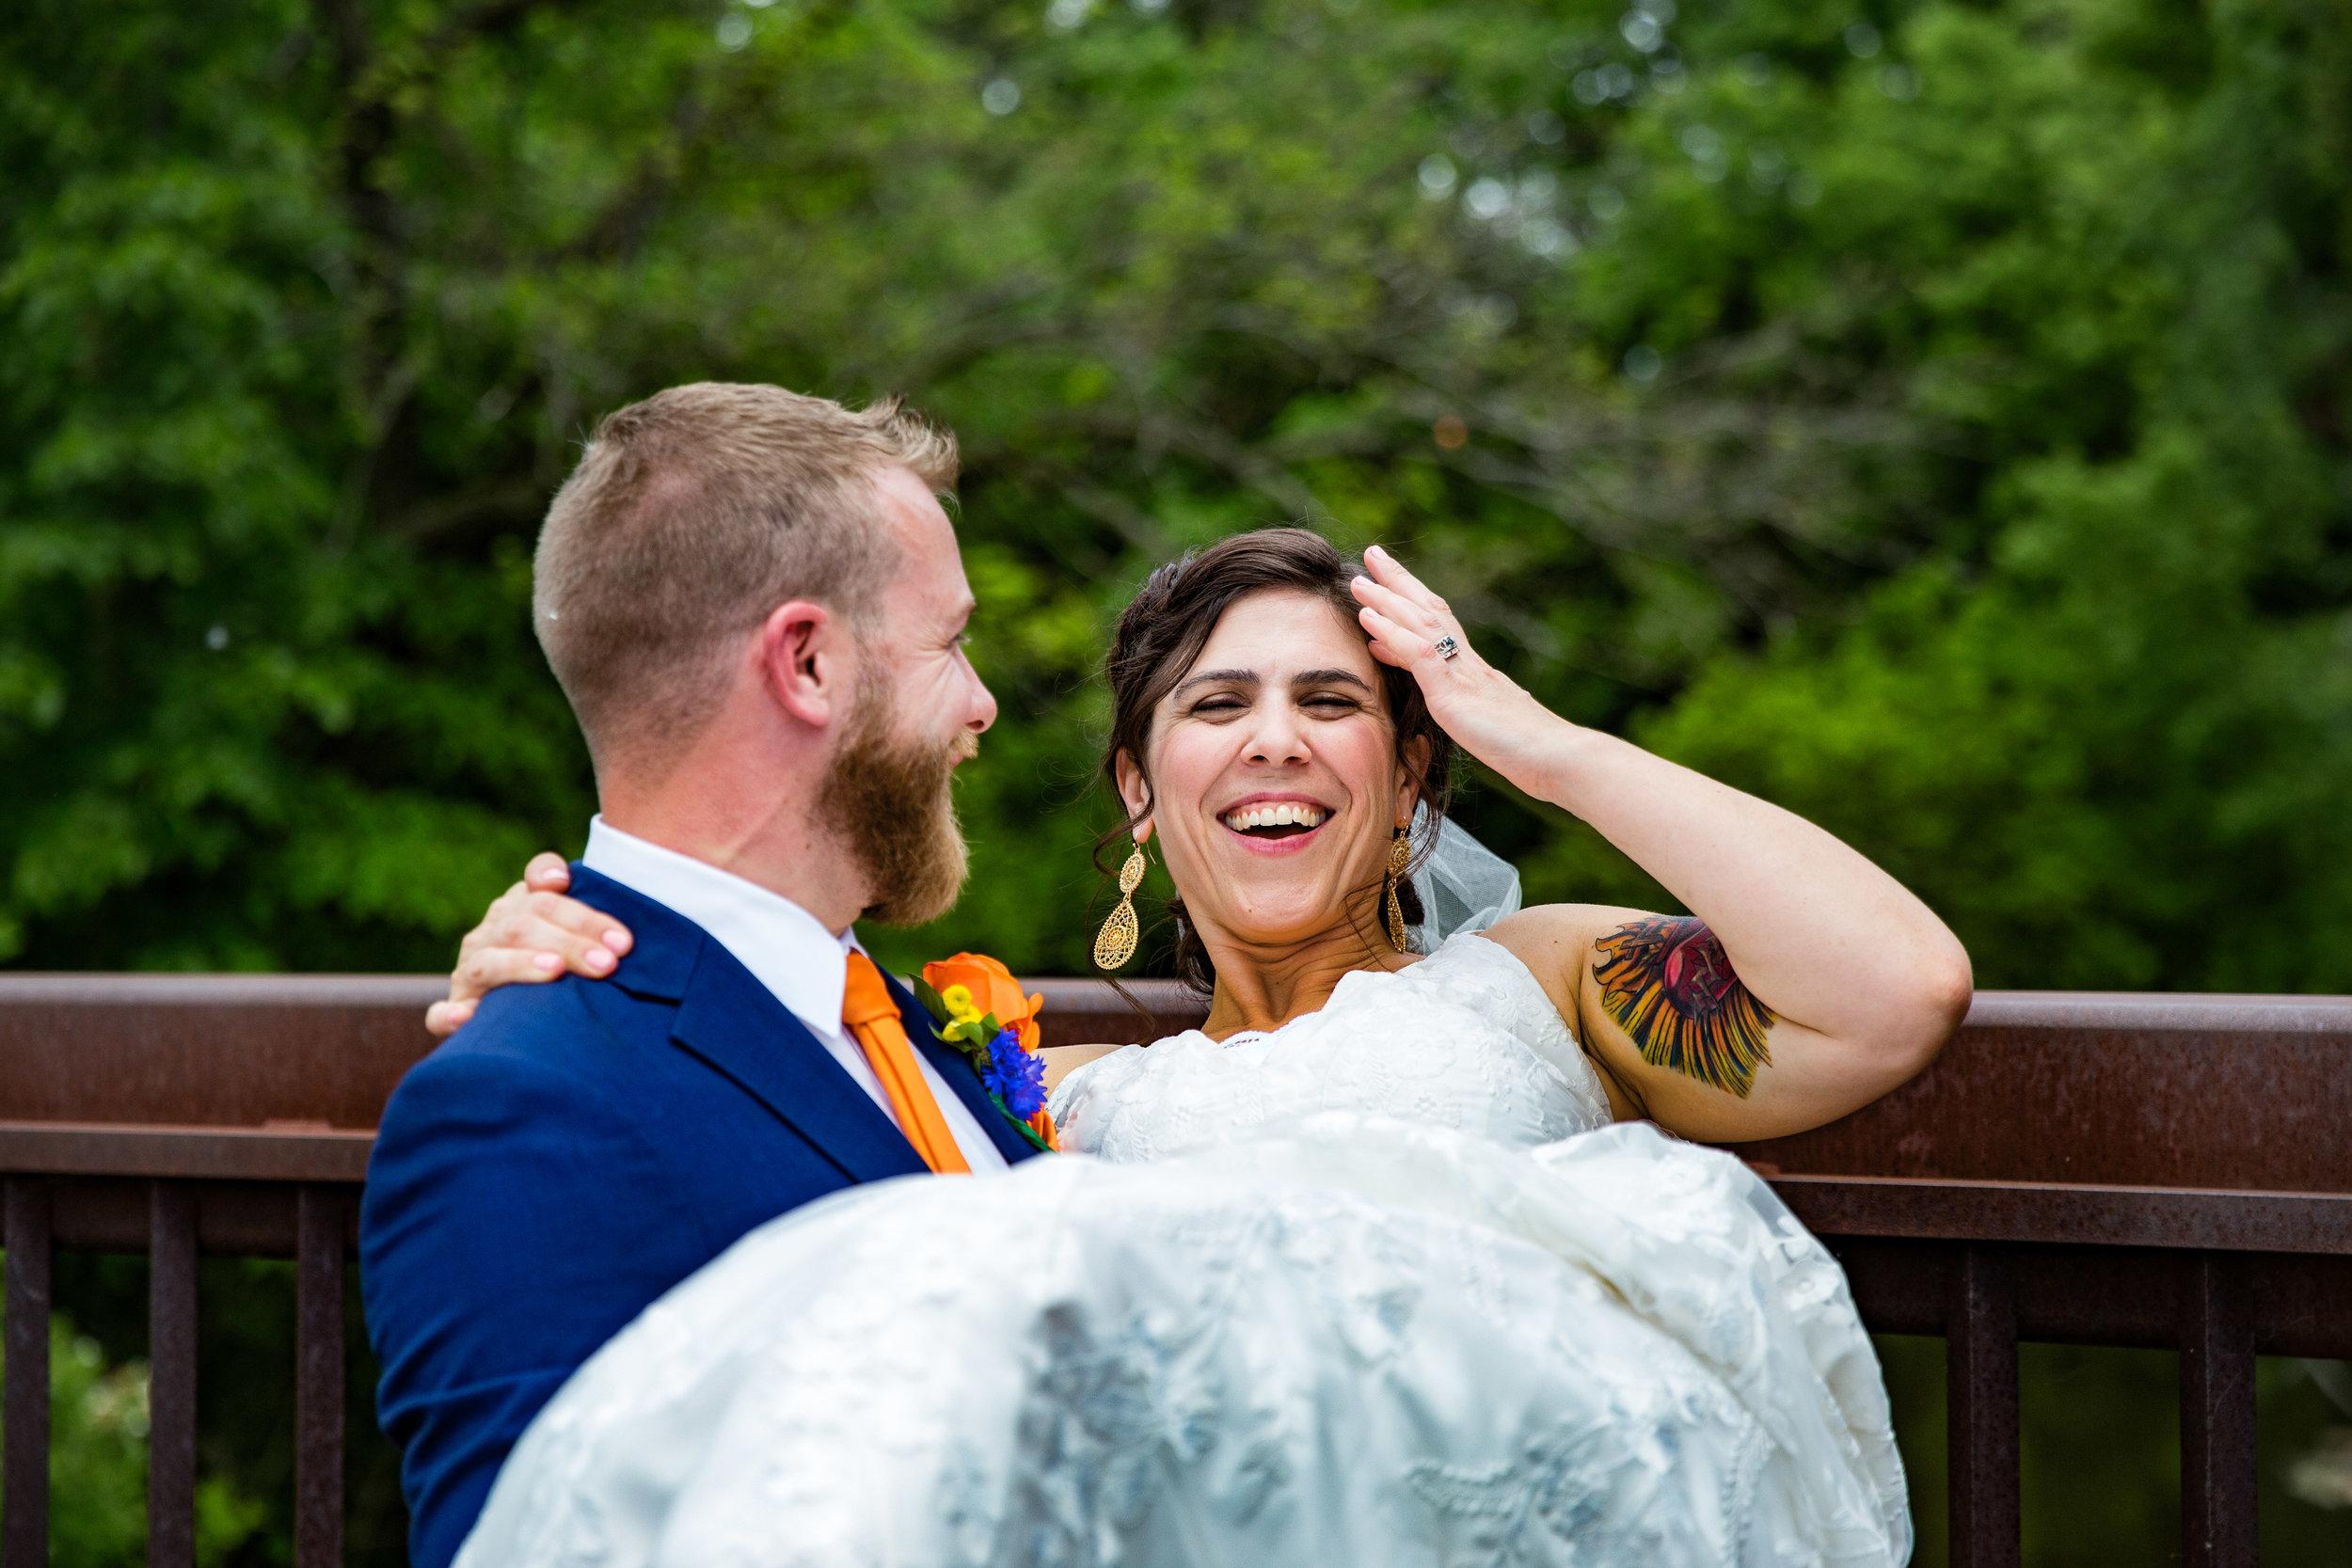 Natalie and Dallas Mooney Wedding 6-8-19_Tania Watt Photography-250.jpg